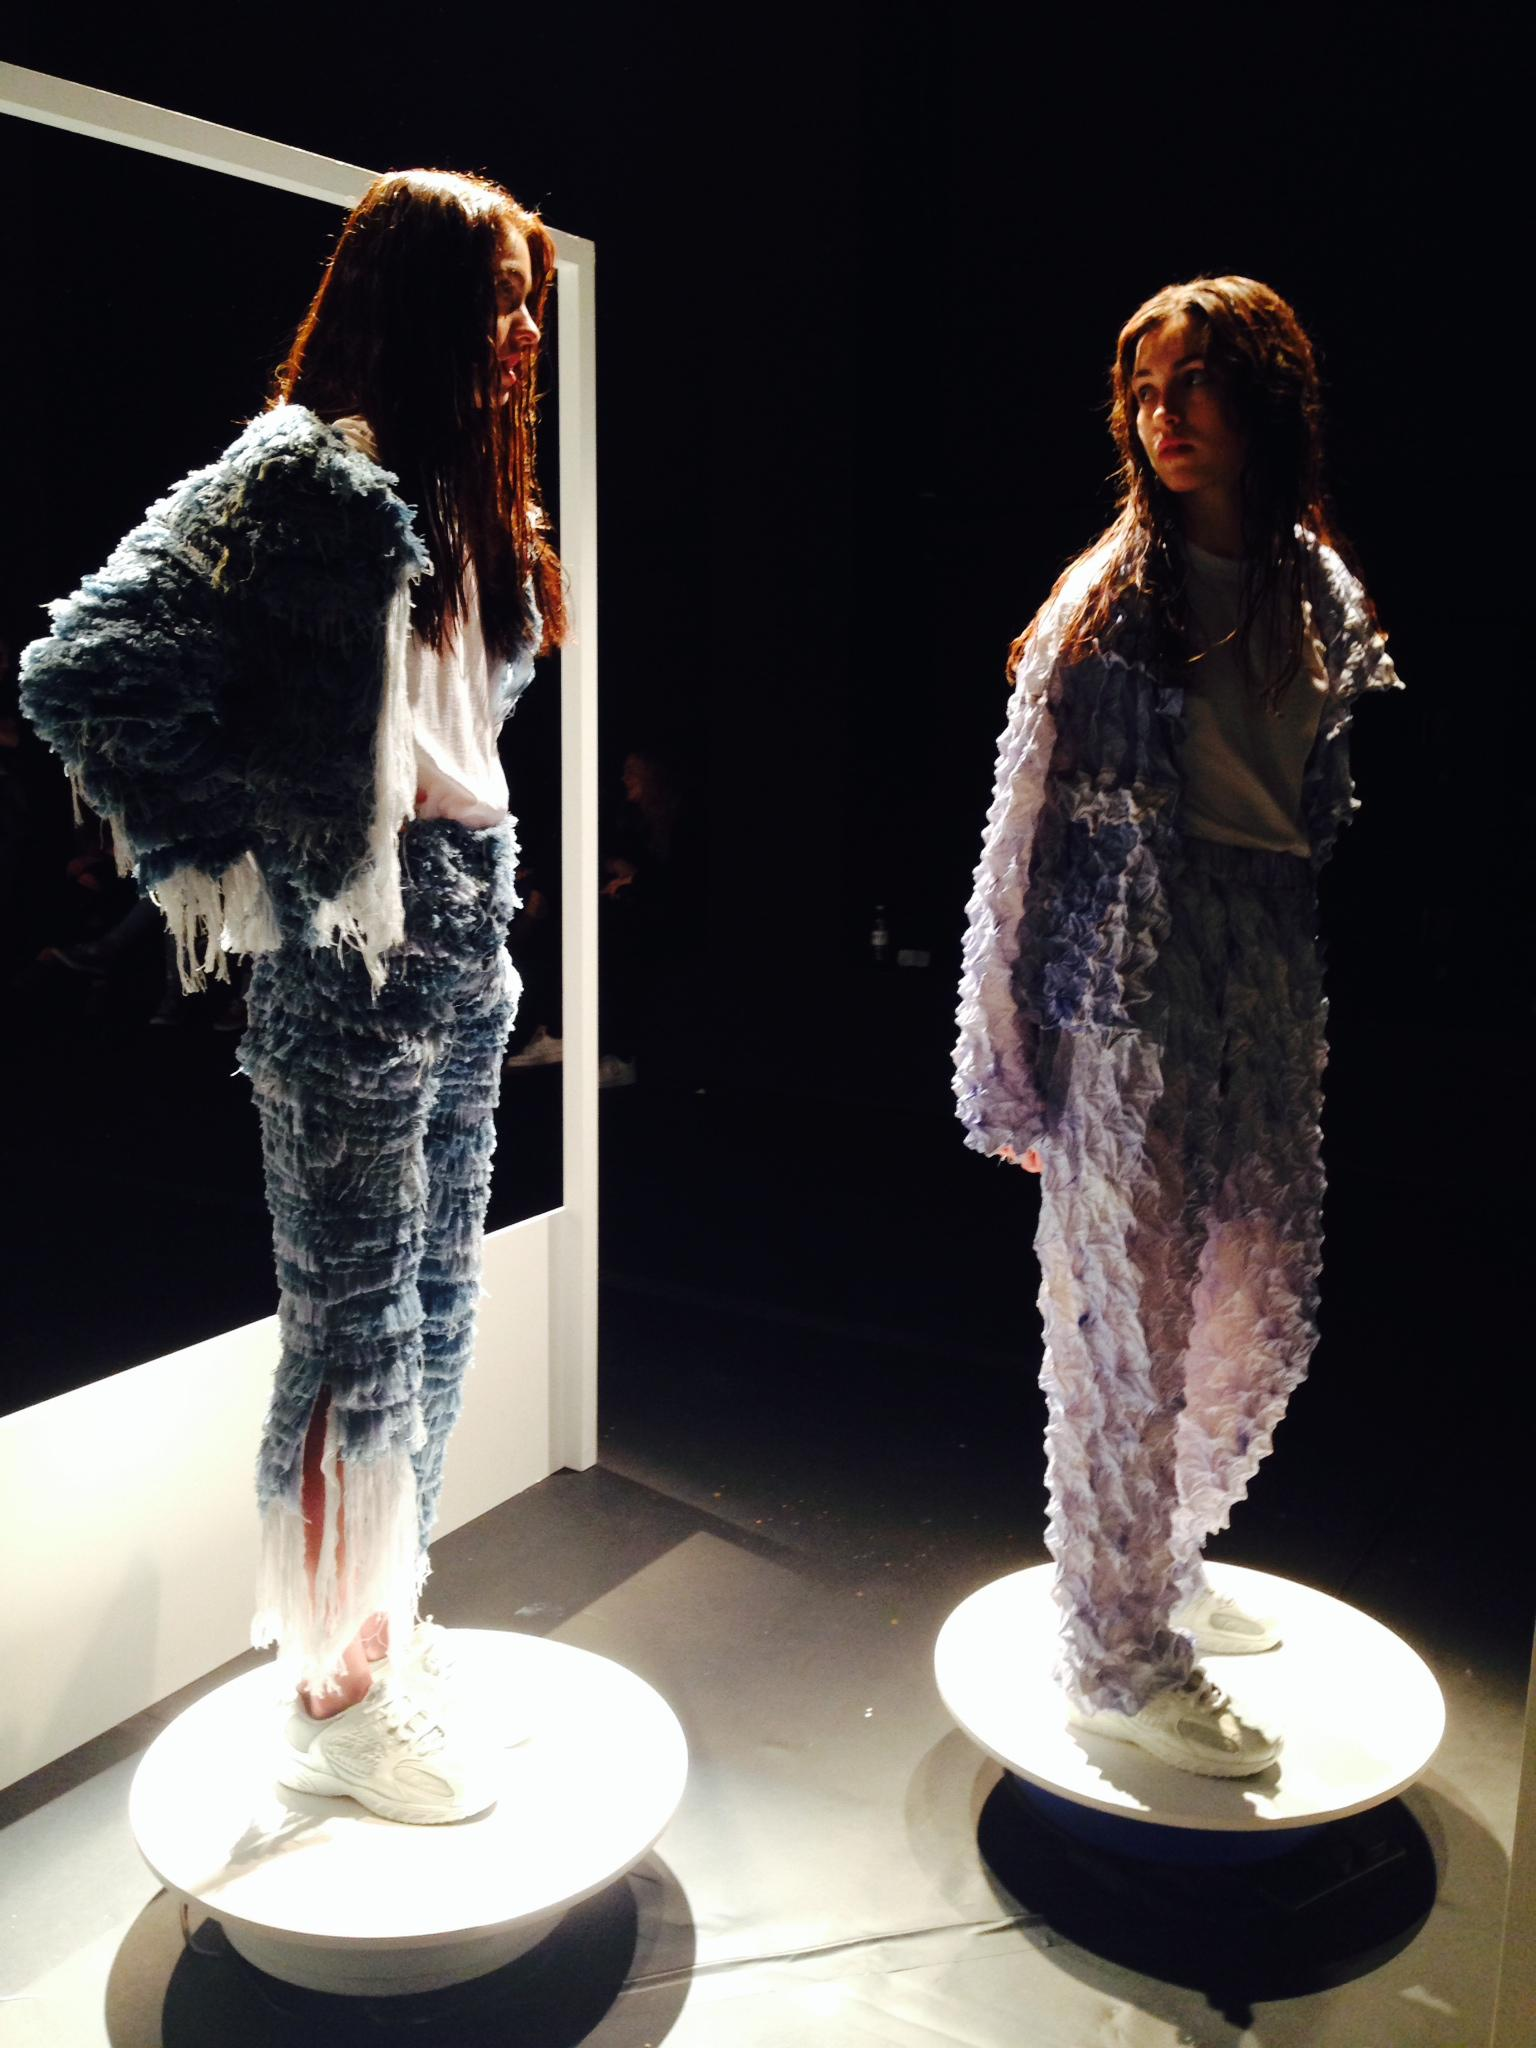 creatrice-francaise-faustine-steinmetz-londres-fashion-week